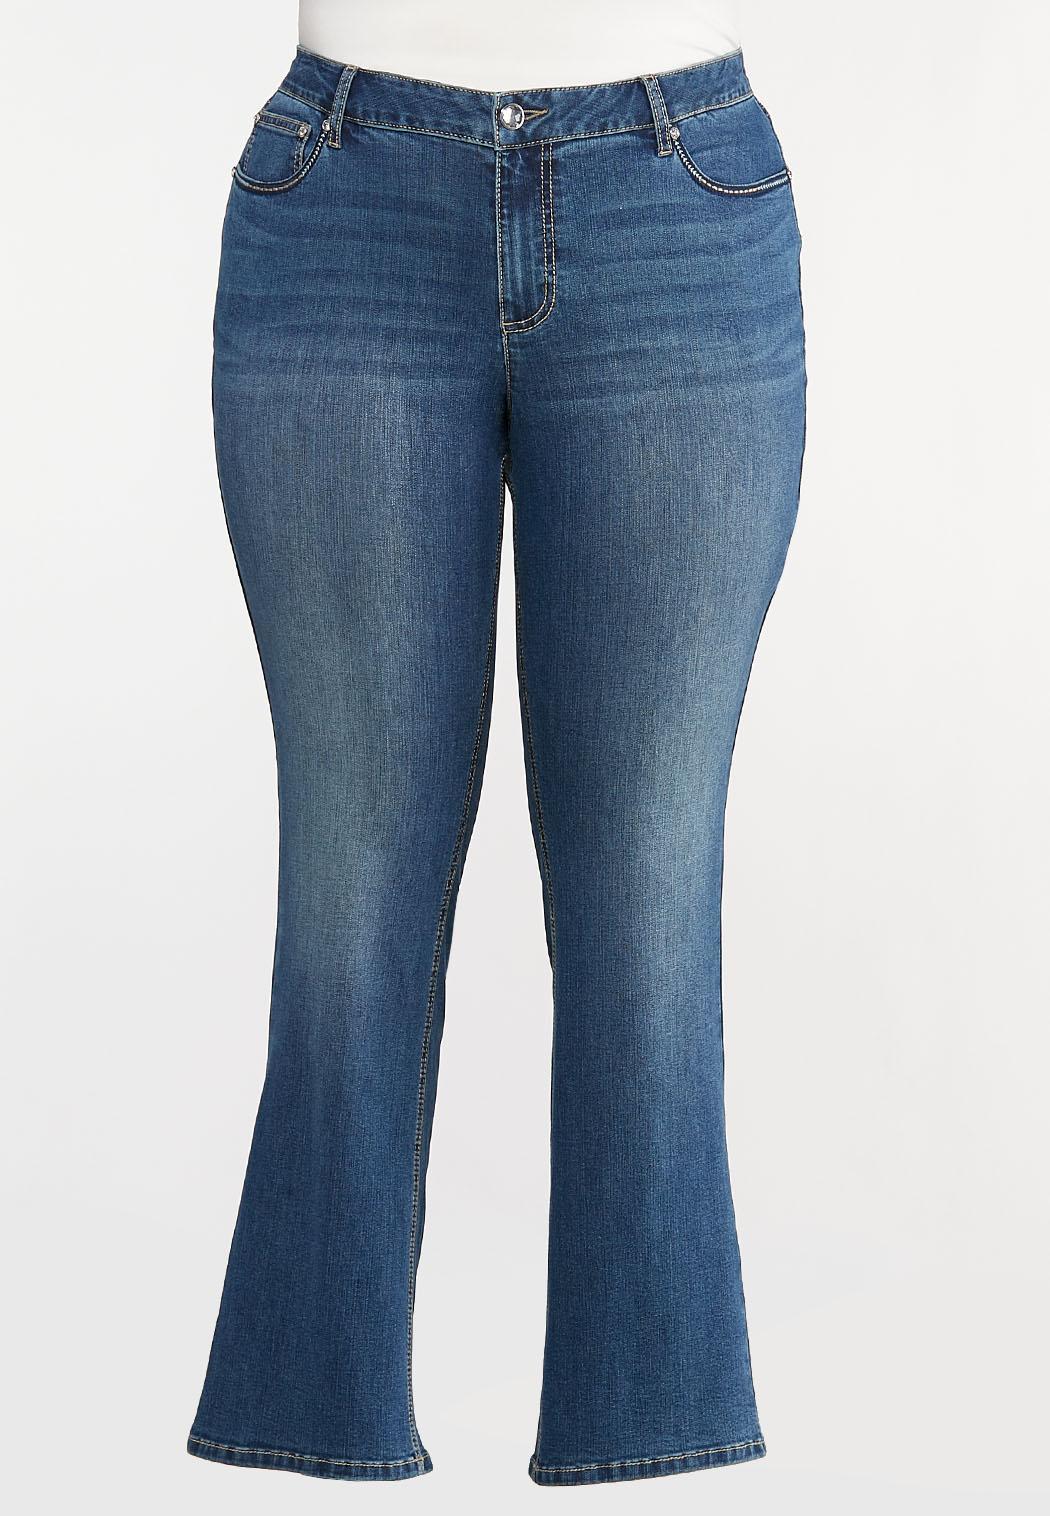 Plus Size Sparkling Floral Pocket Jeans